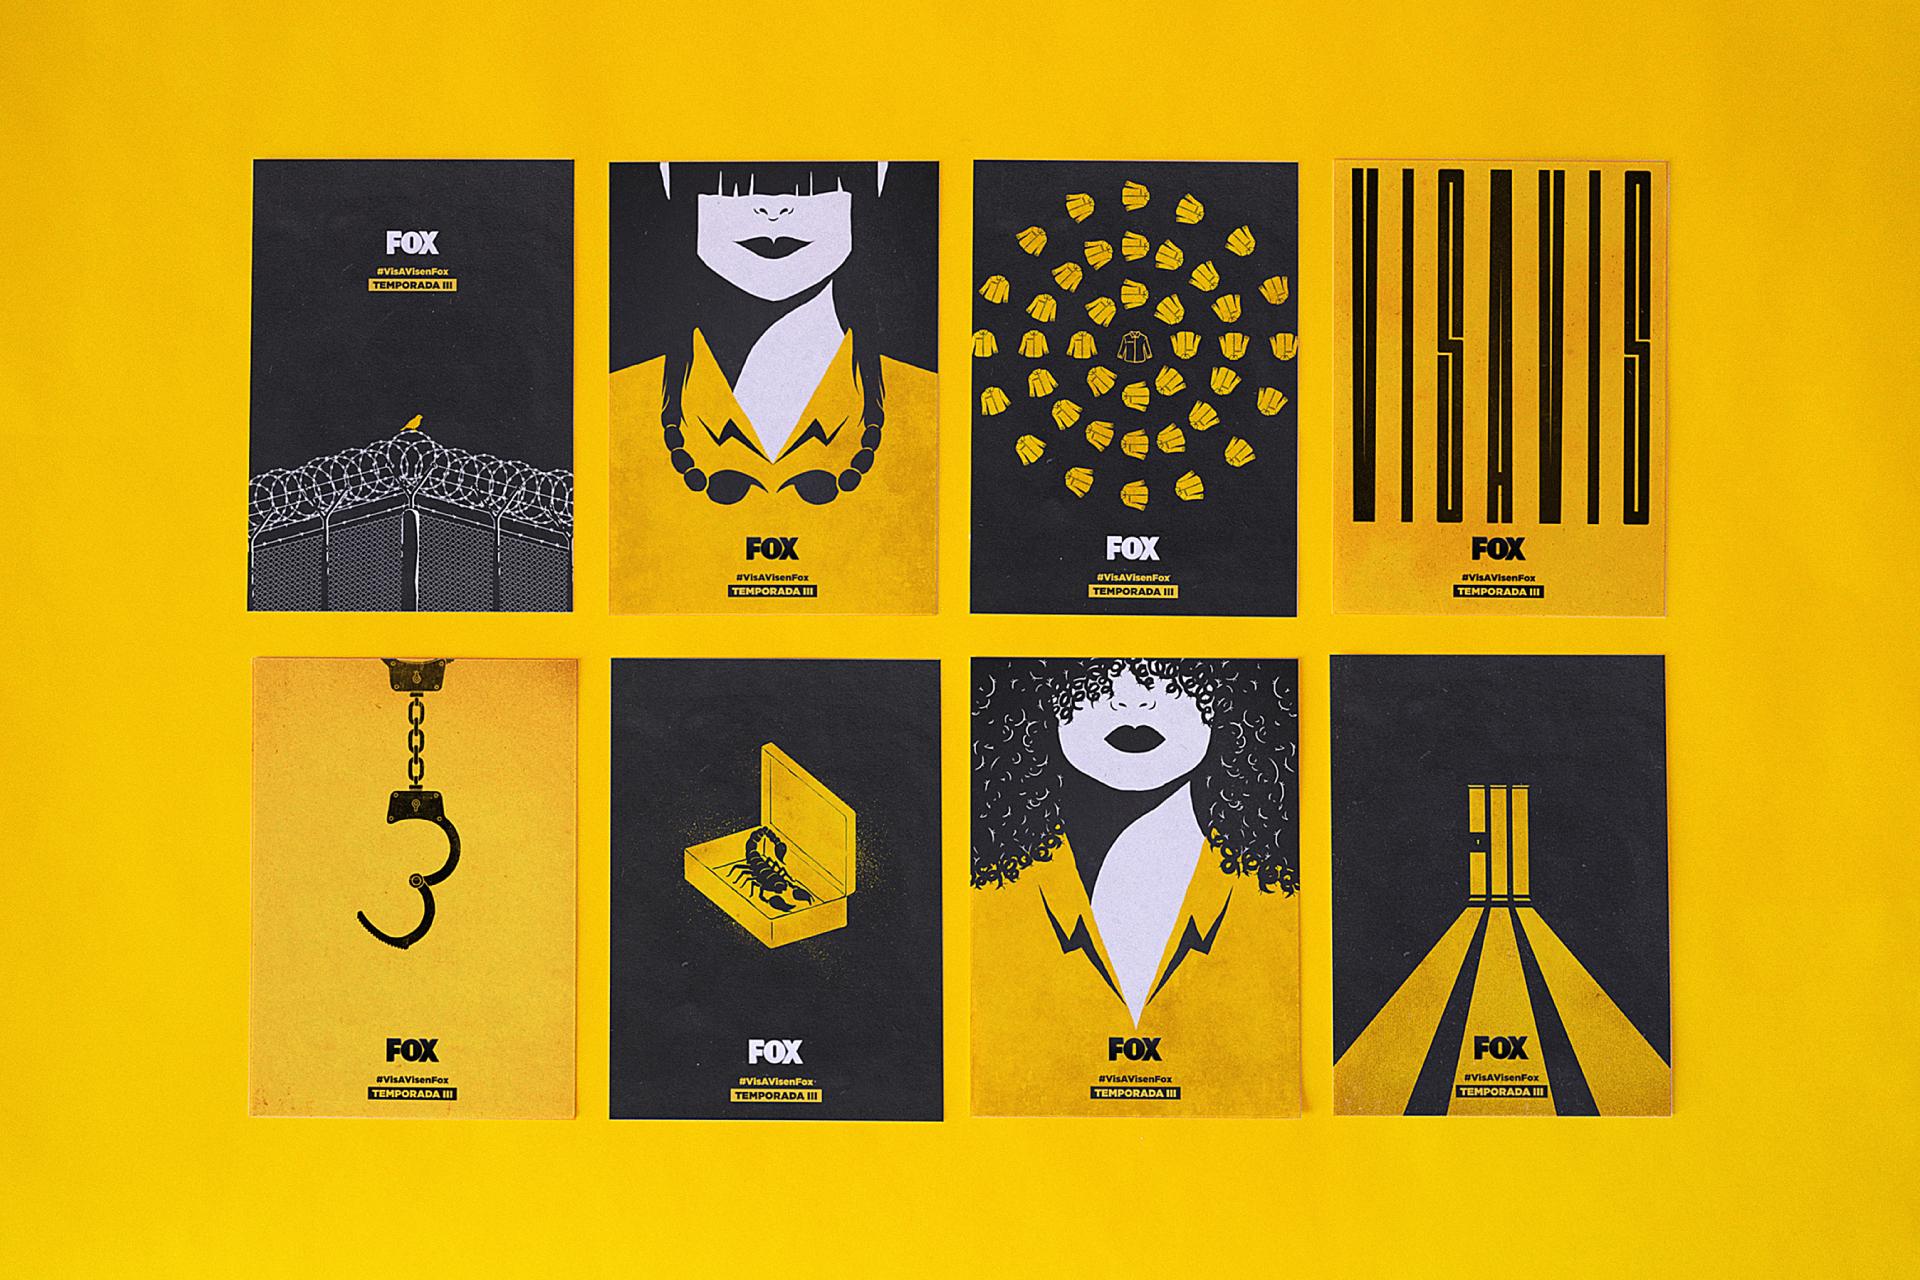 #VisAVisEnFox Teaser Posters Header